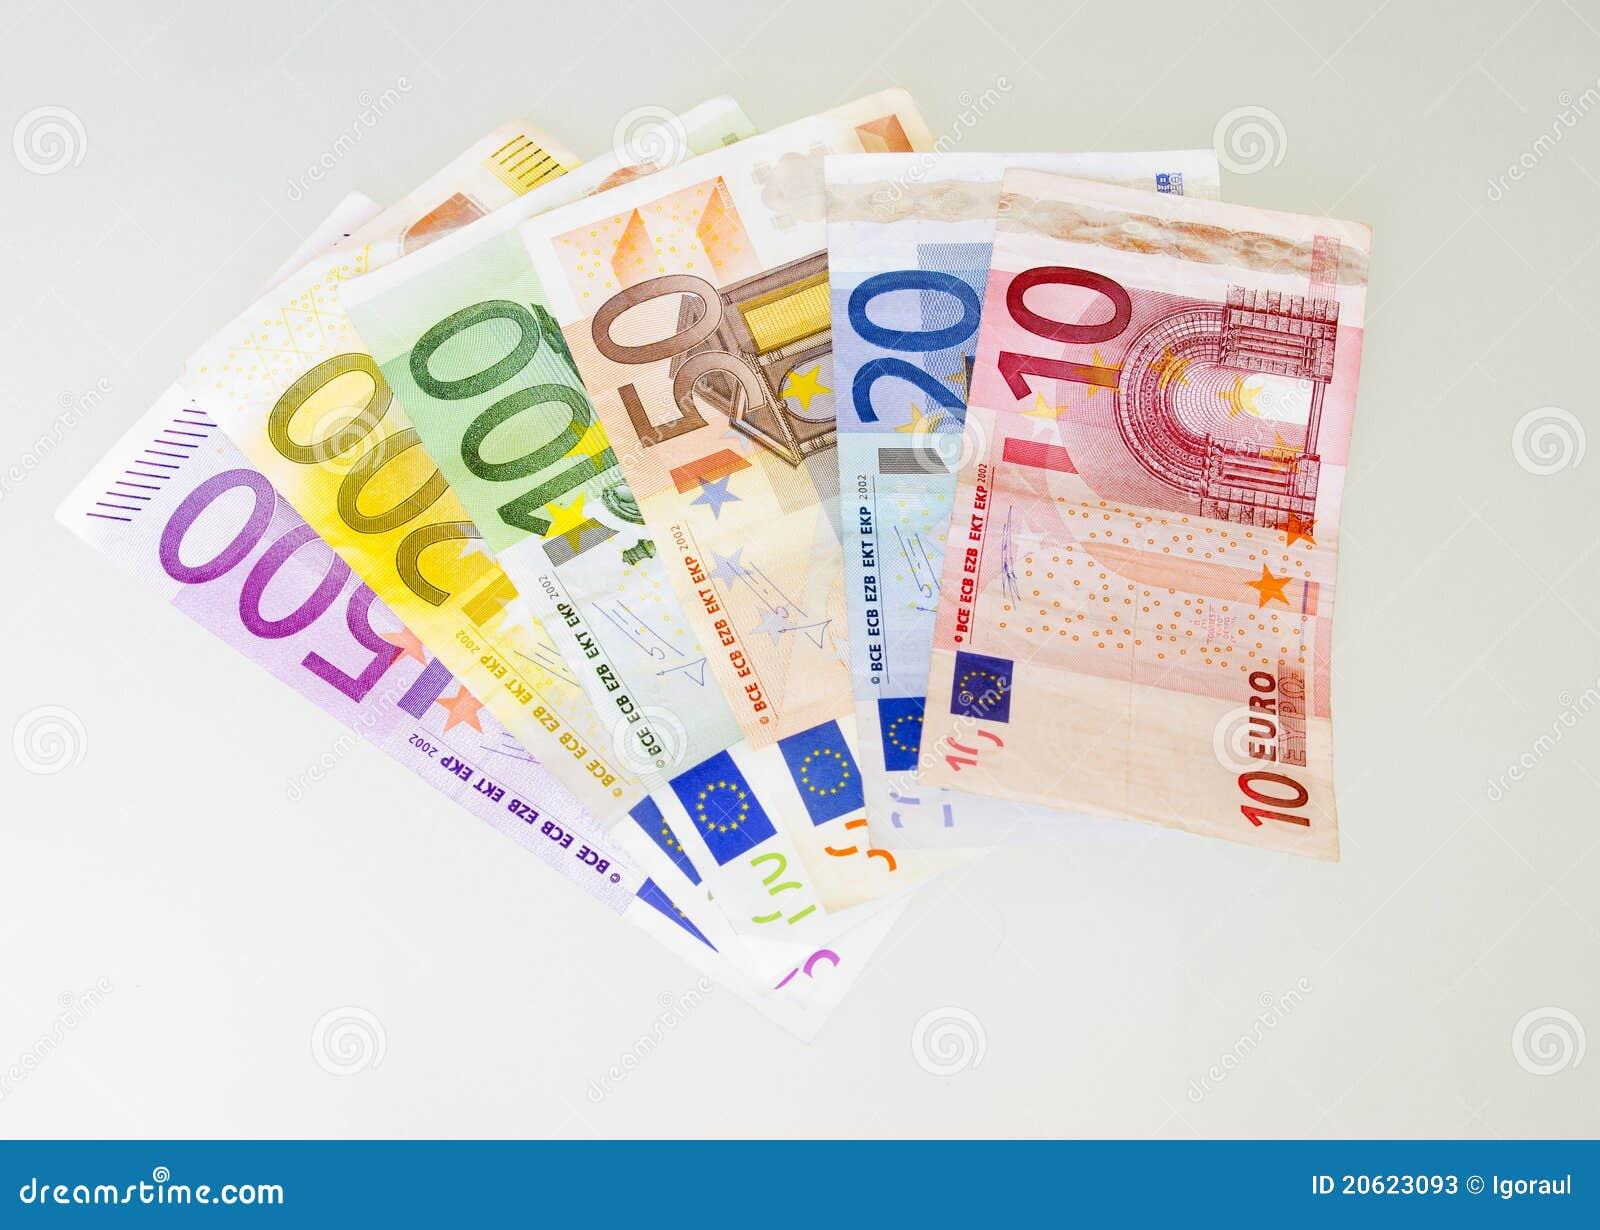 500 Euro Bill Stock Photos - Image: 20623093